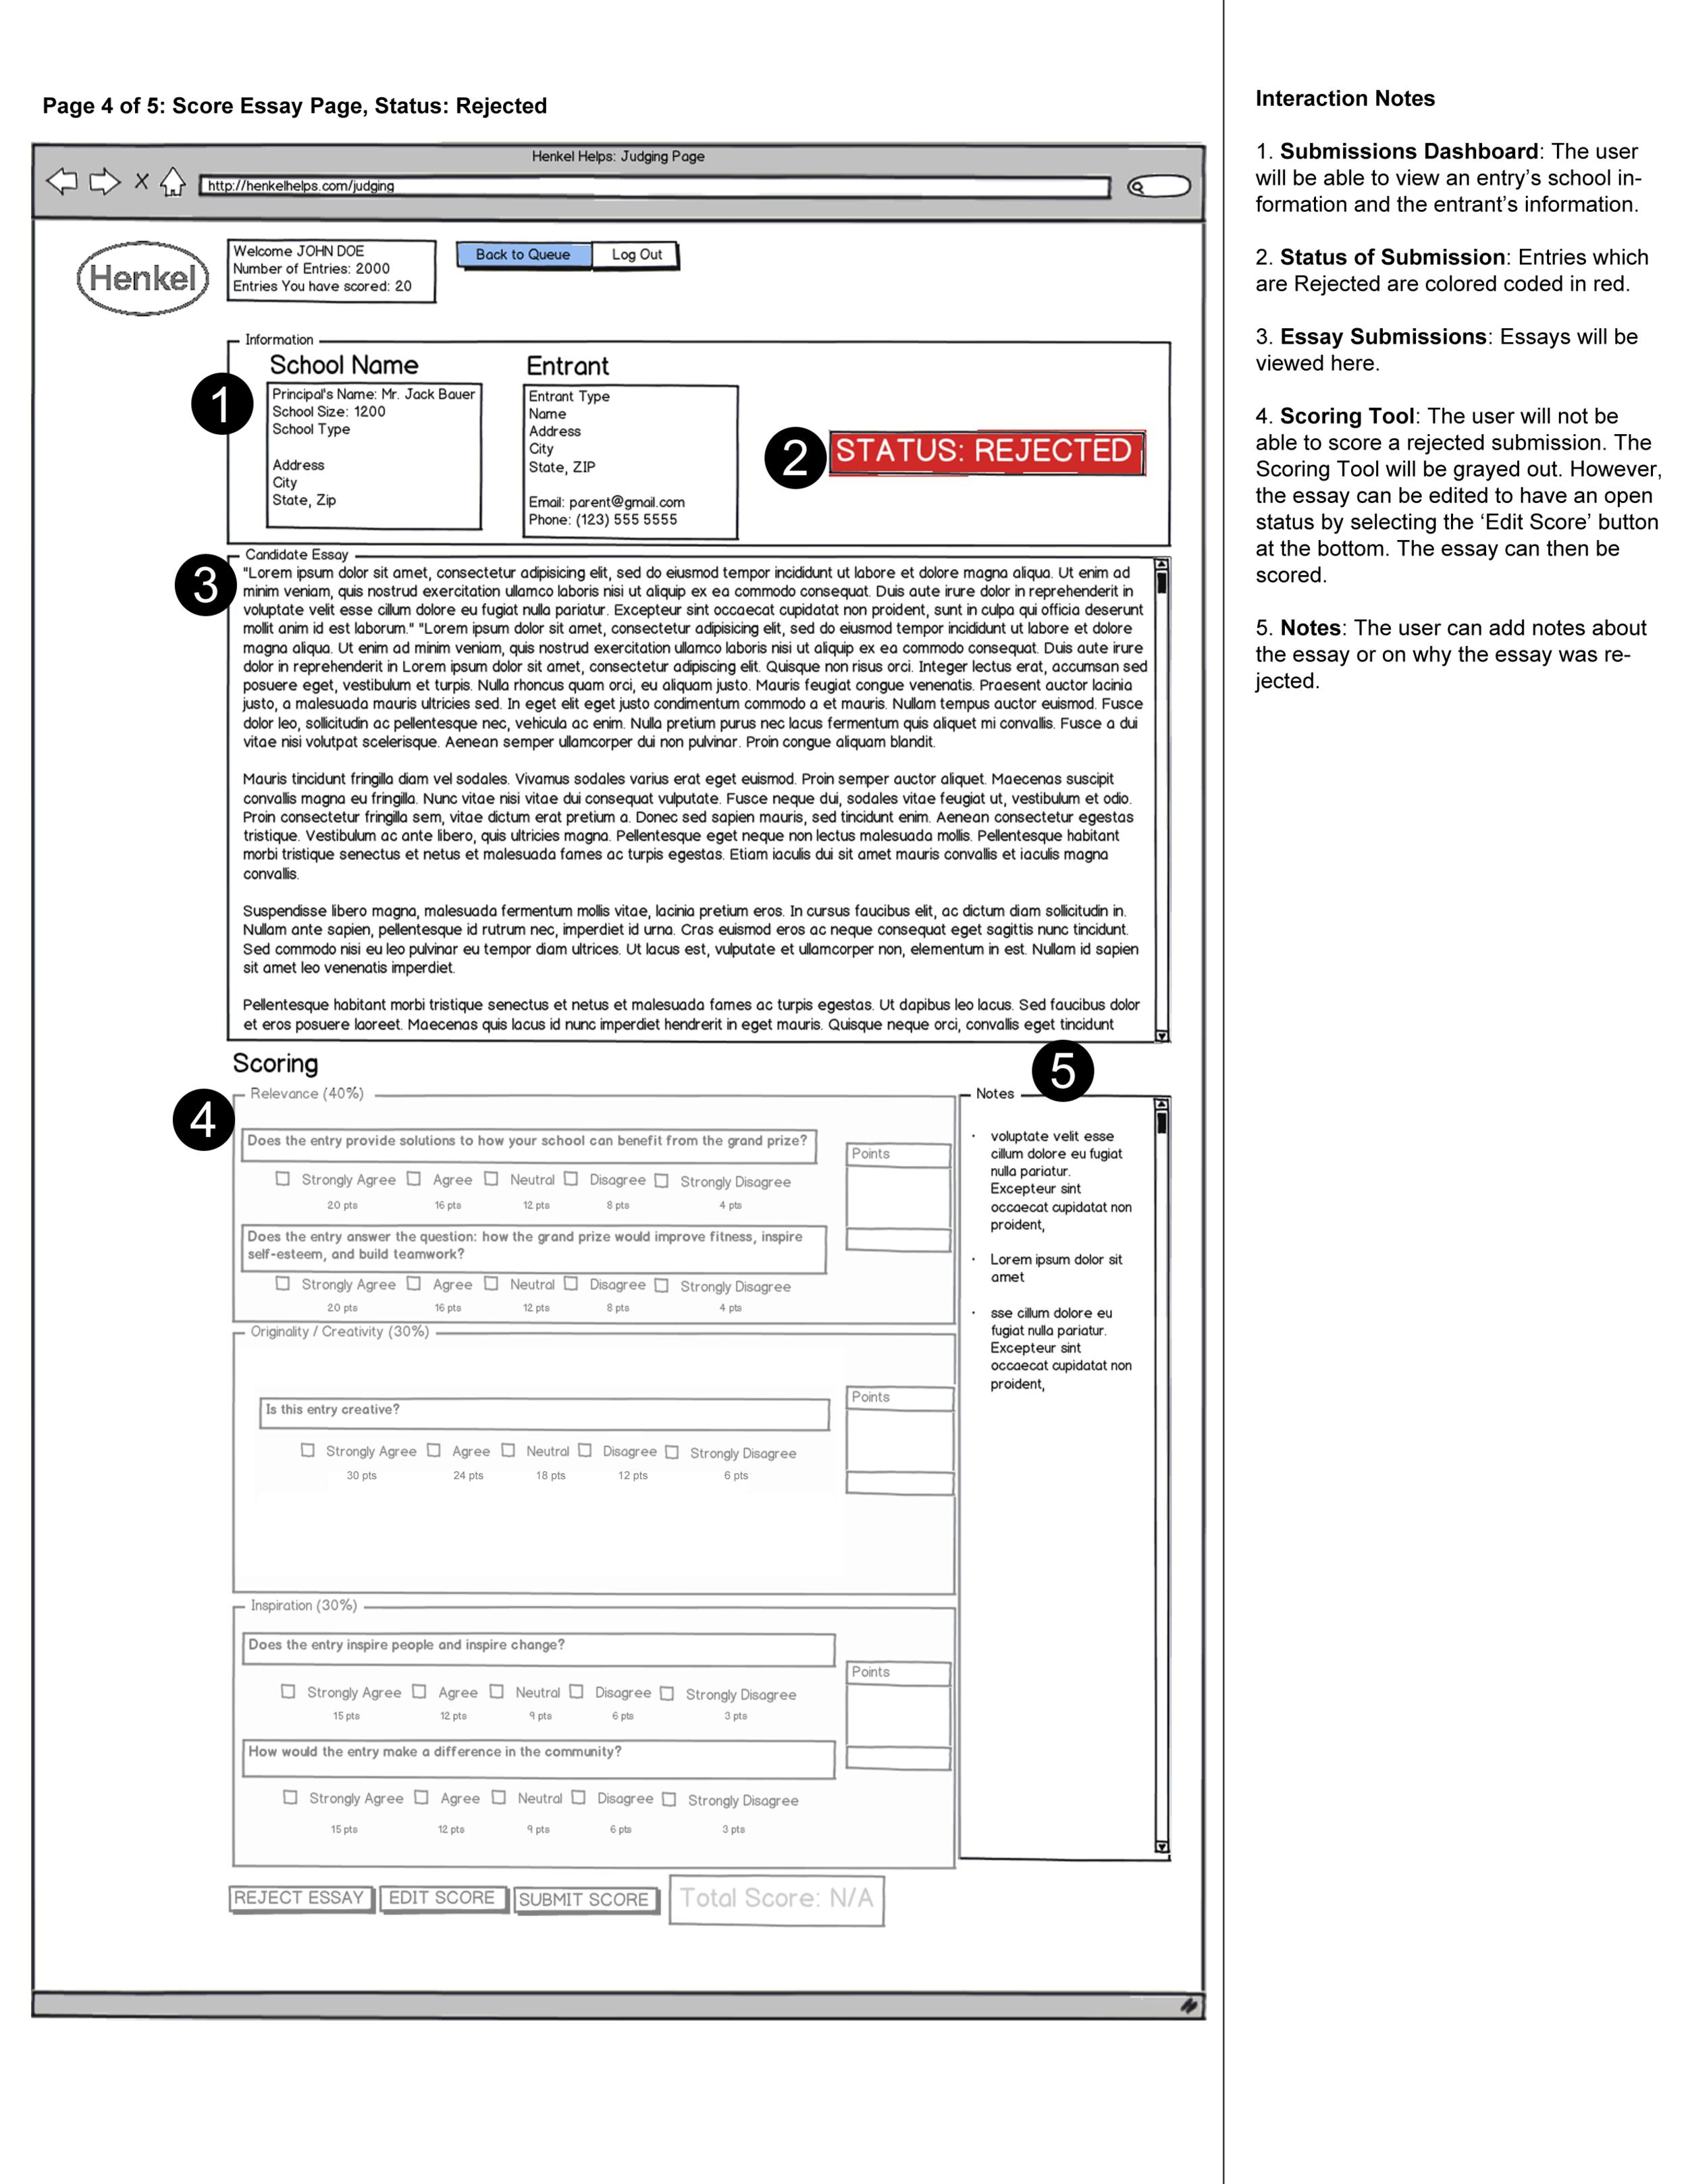 Henkel UI Status Rejected.png